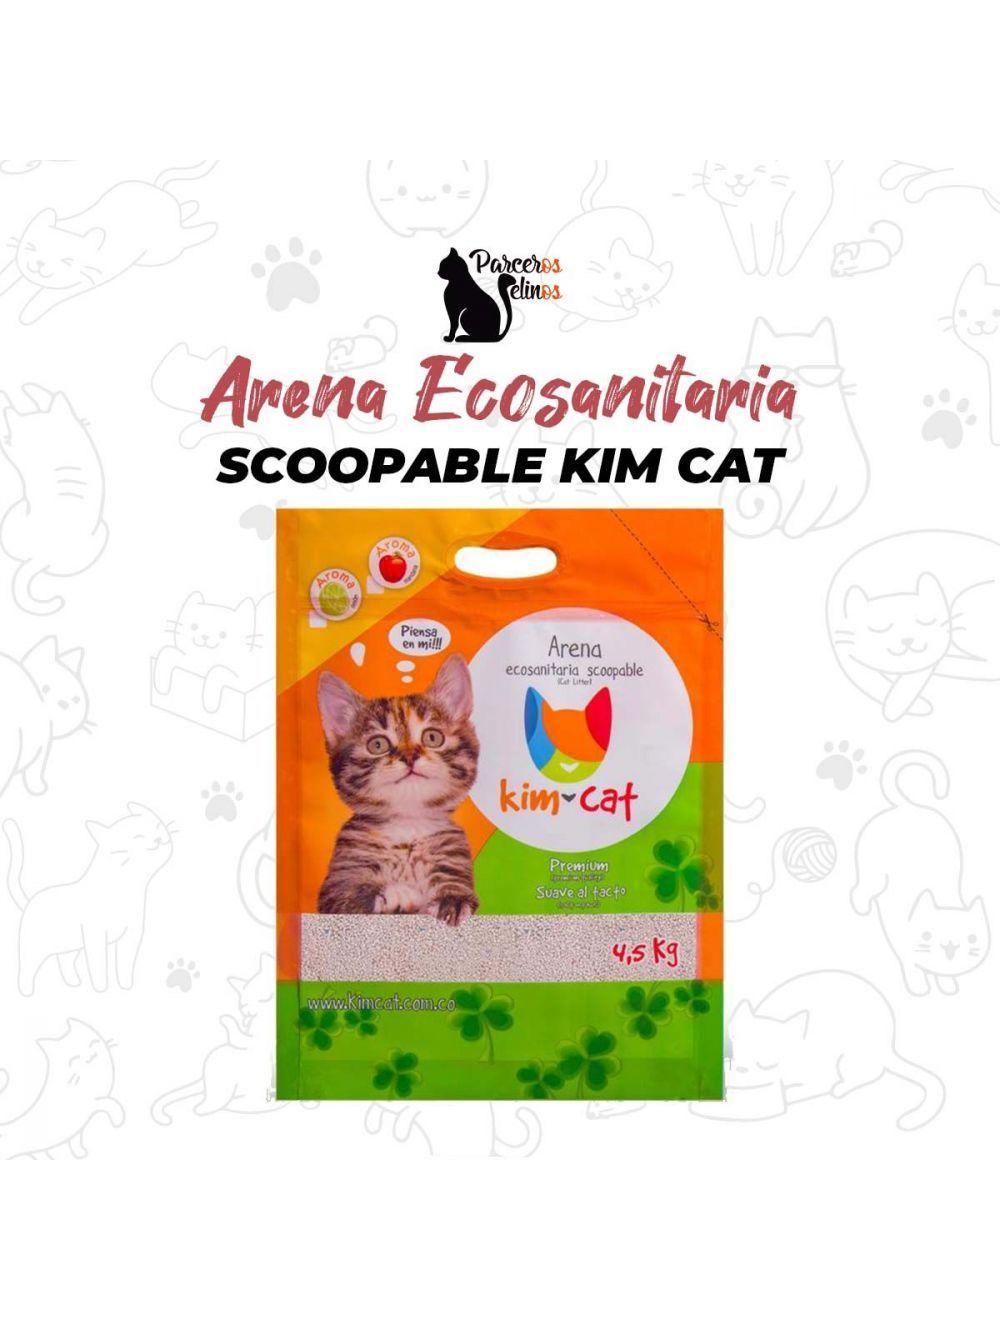 Arena Ecosanitaria Scoopable Kim Cat 10Kg - Ciudaddemascotas.com